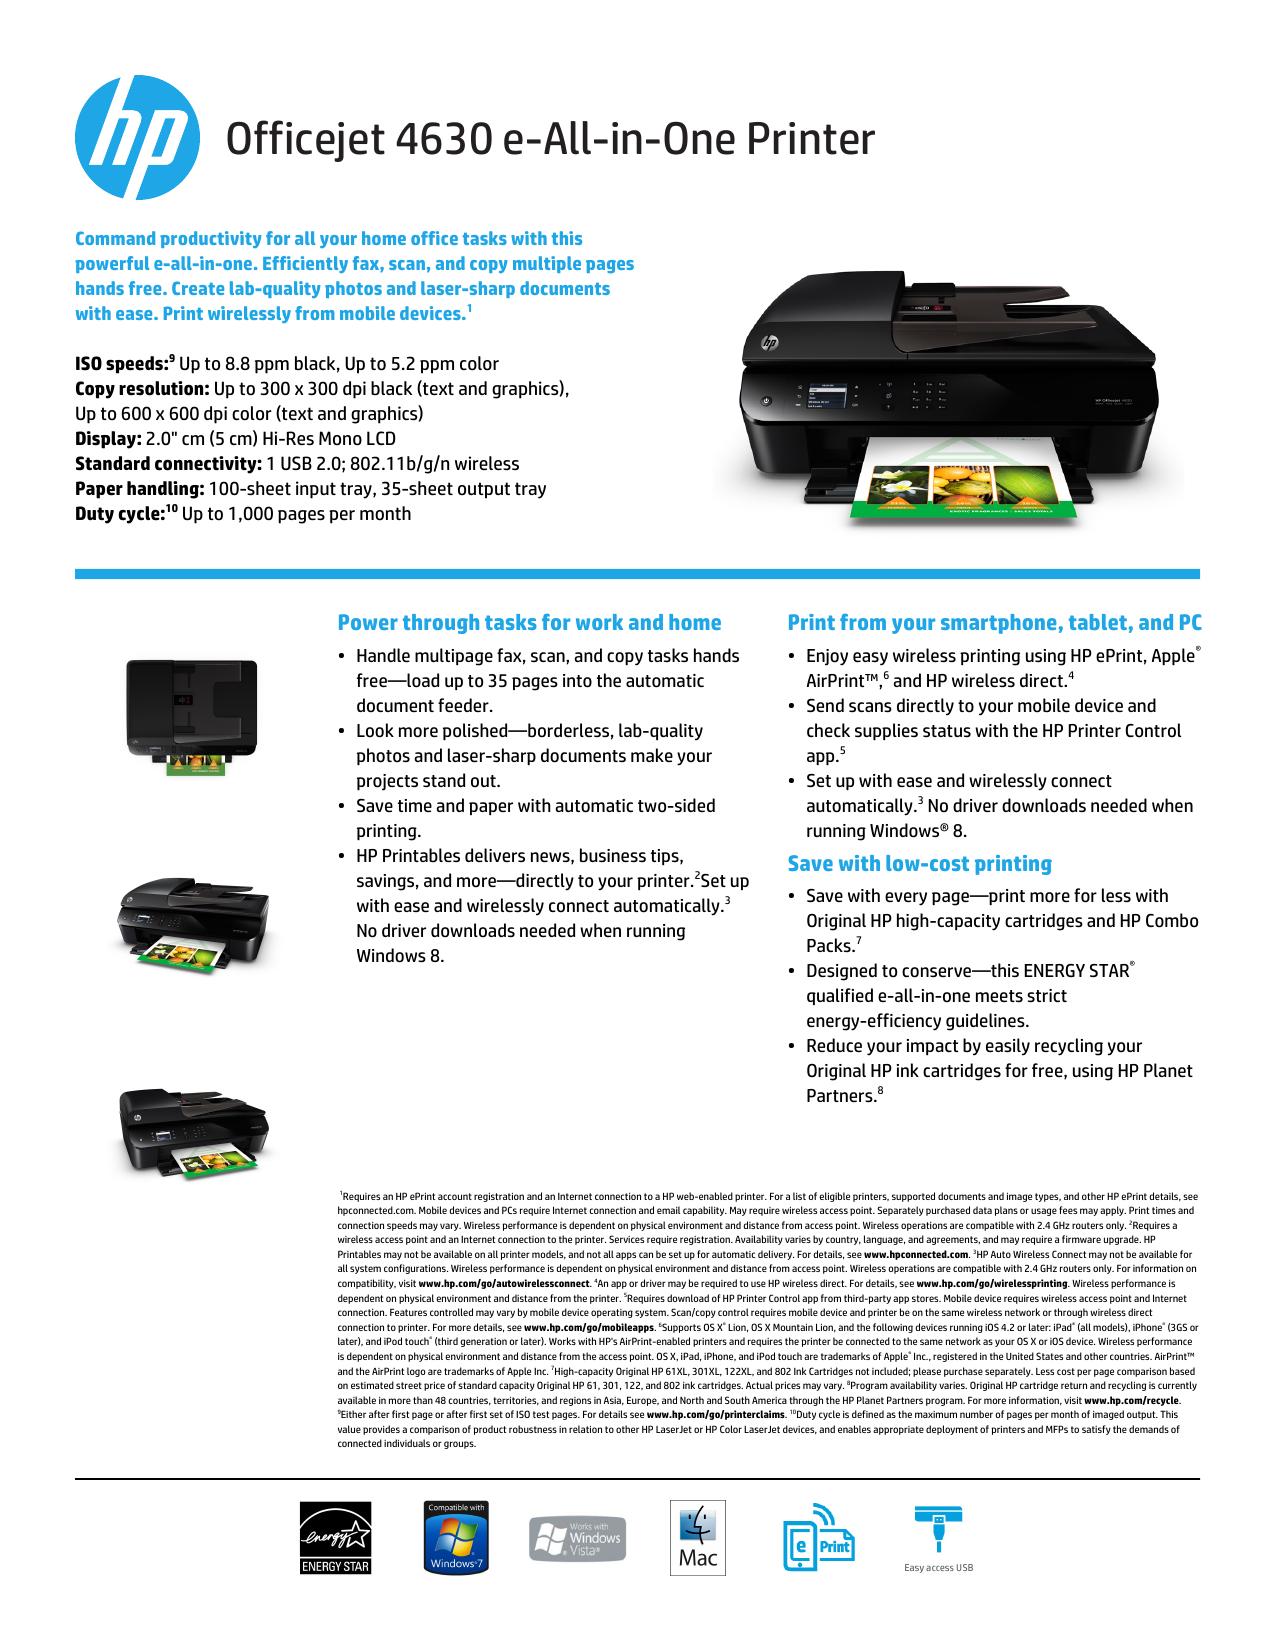 Officejet 4630 e-All-in-One Printer | manualzz com